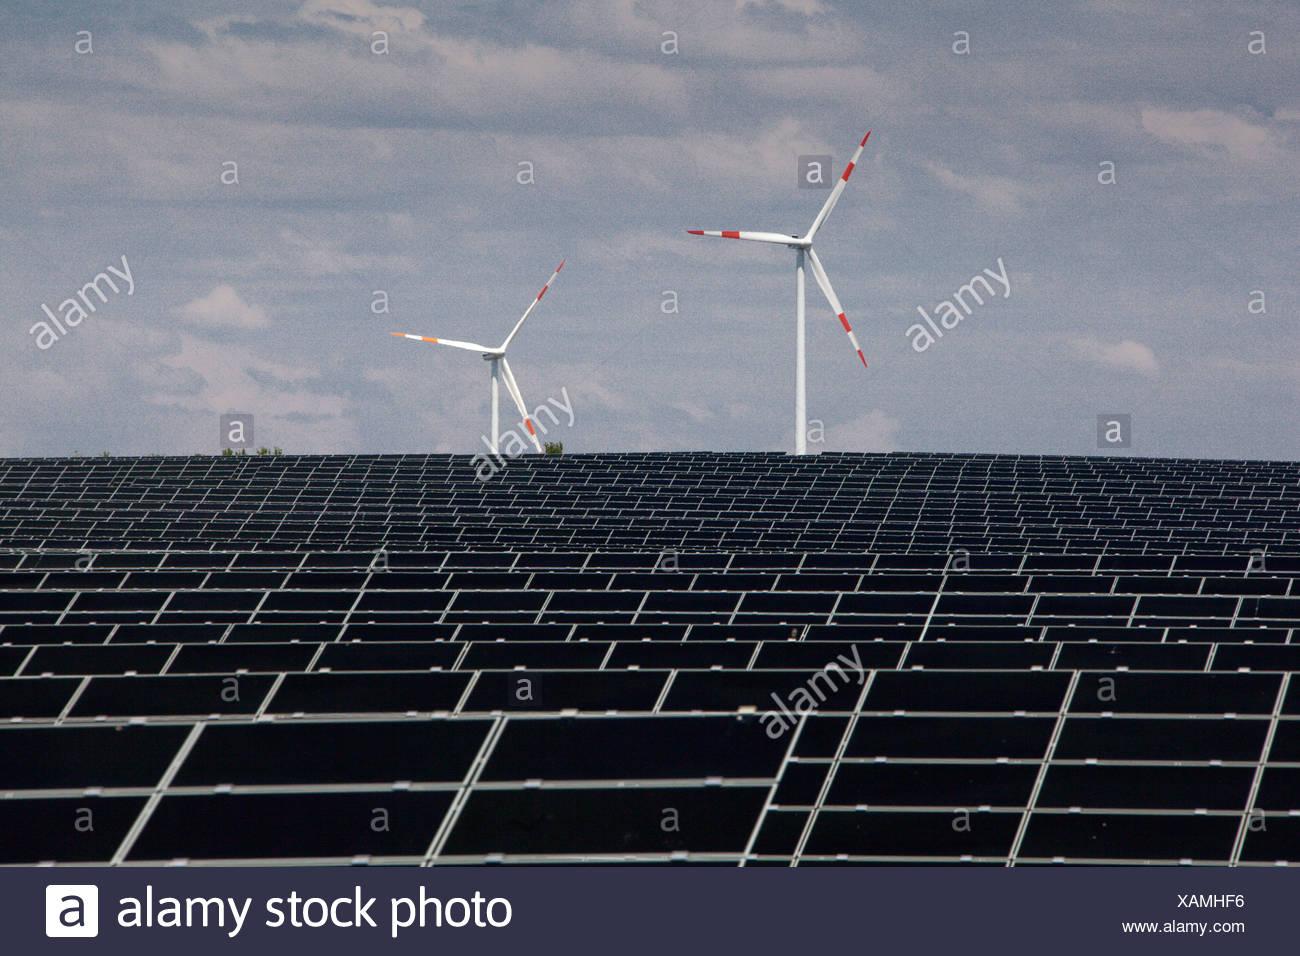 Deutschland, Energie, Solarenergie, Sonnenenergie, Windturbine, alternative Energien, Ökologie, Energie, Solar, panel Stockbild